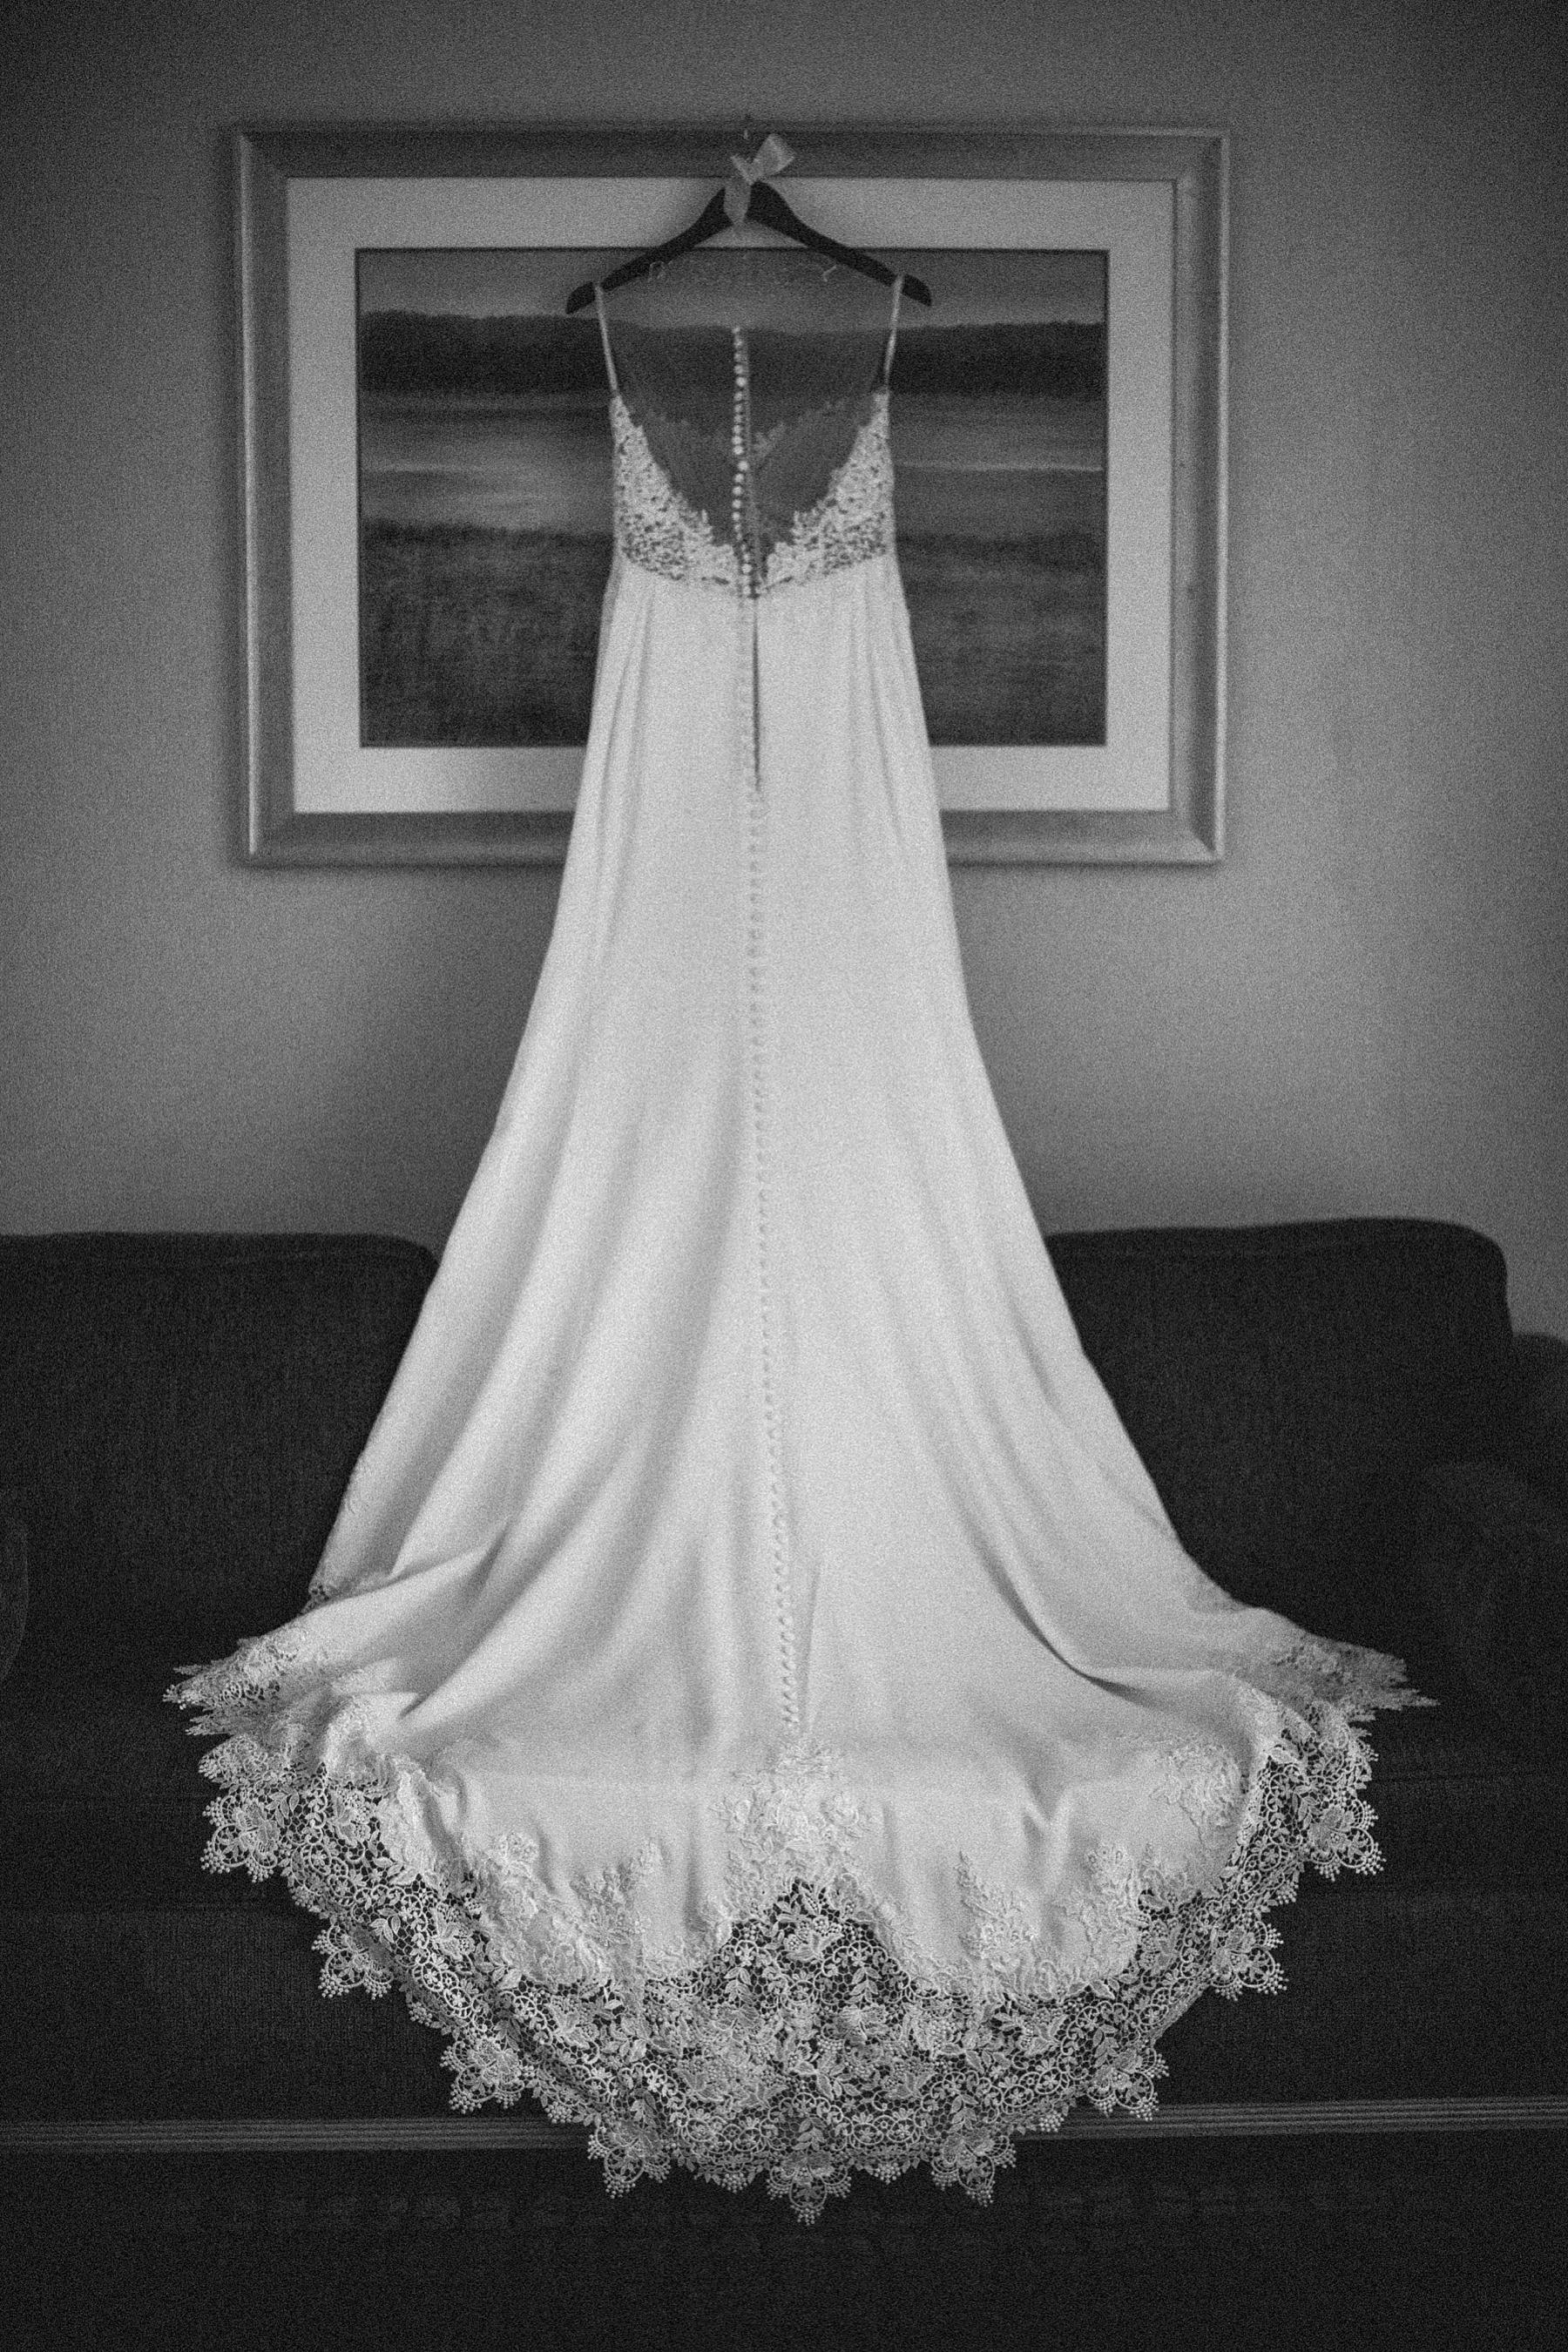 jersey-city-nj-wedding-photographer-top_0003.jpg